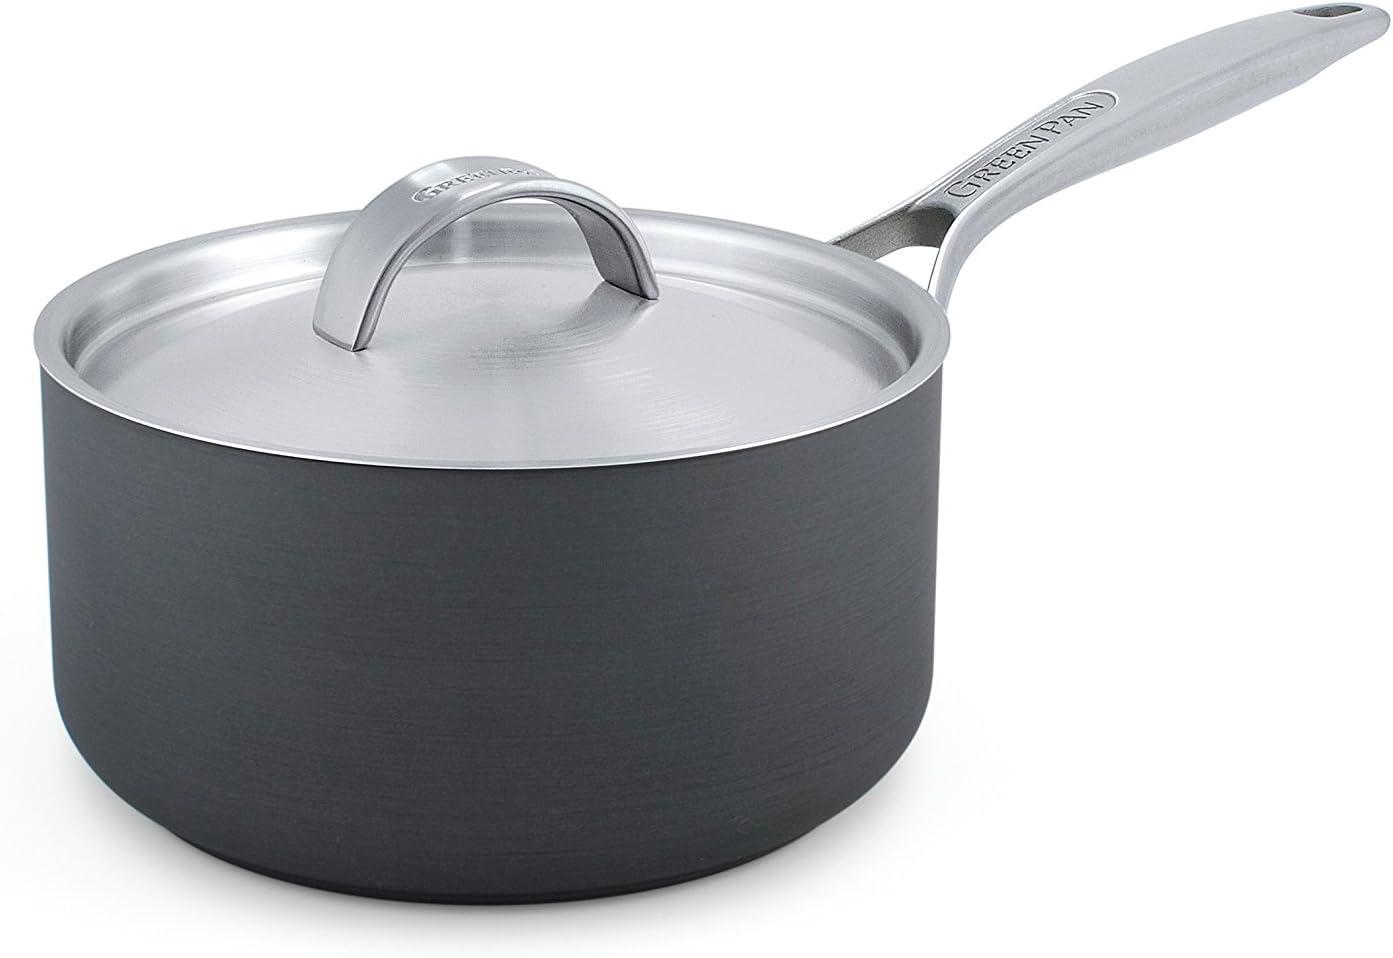 GreenPan Paris 2 Quart Non-Stick Dishwasher Safe Ceramic Covered Sauce Pan, Gray - CC000020-001